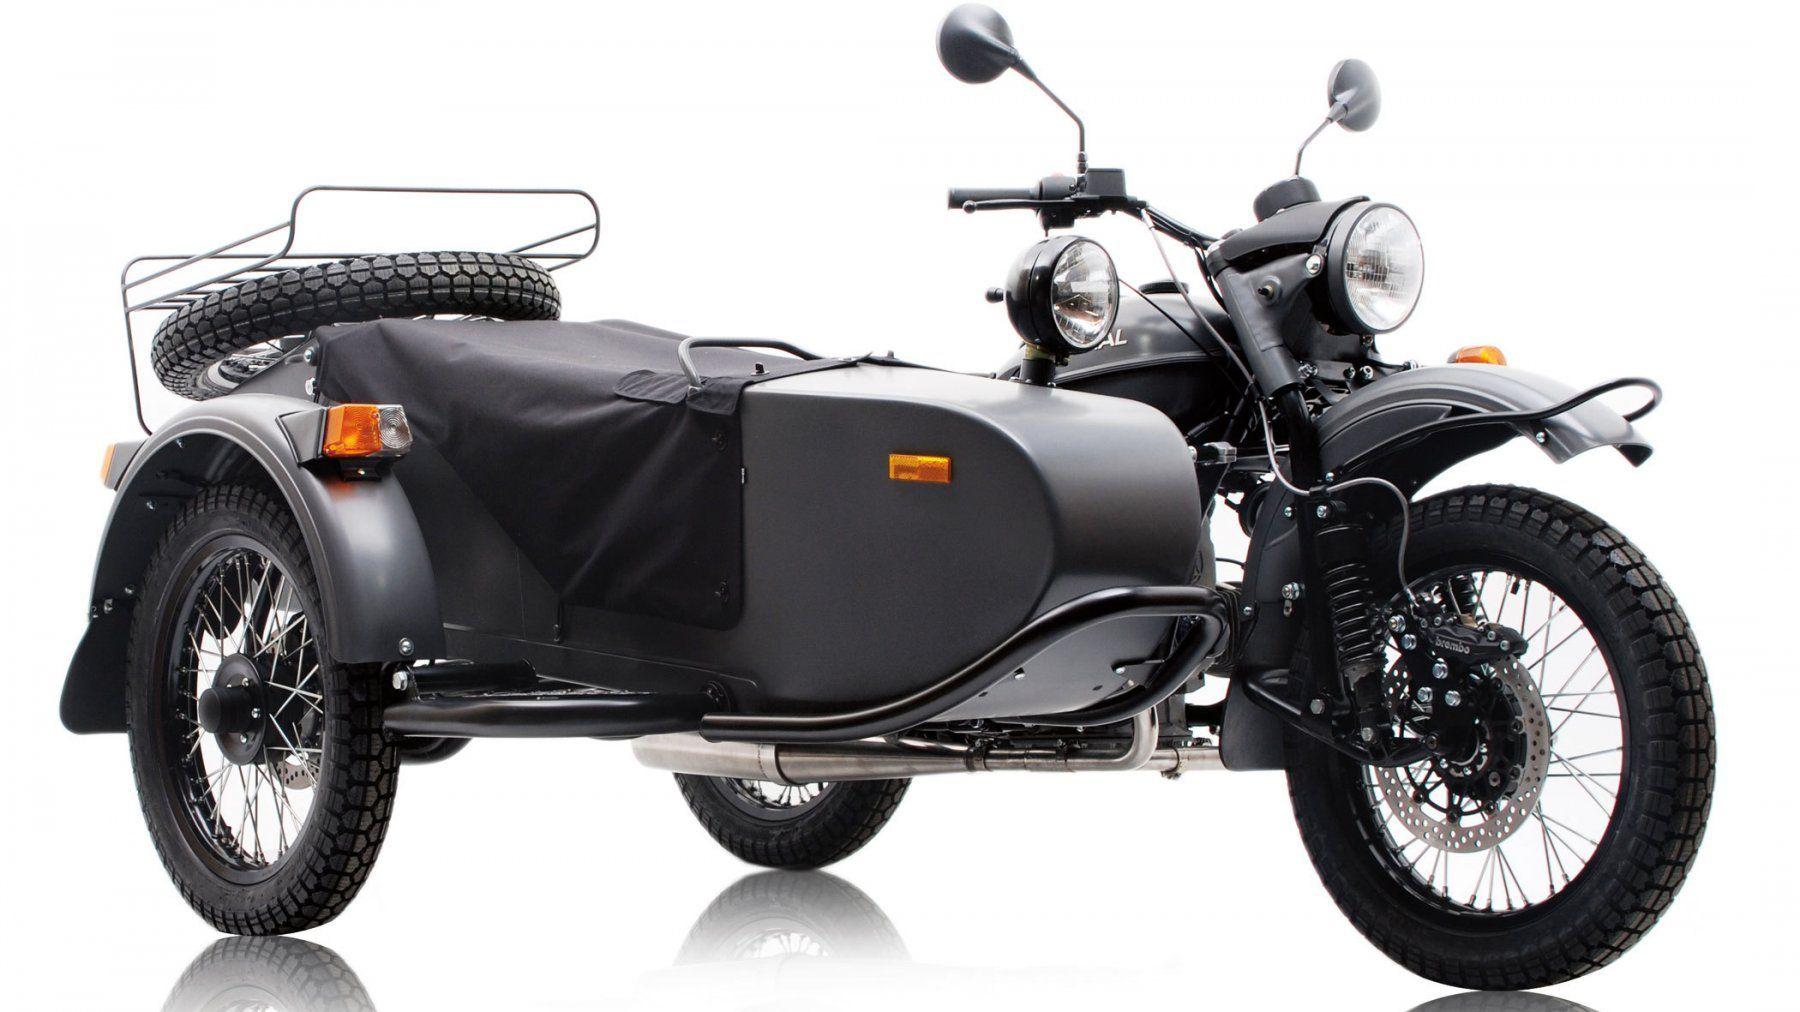 le side car moto scooter motos d 39 occasion. Black Bedroom Furniture Sets. Home Design Ideas